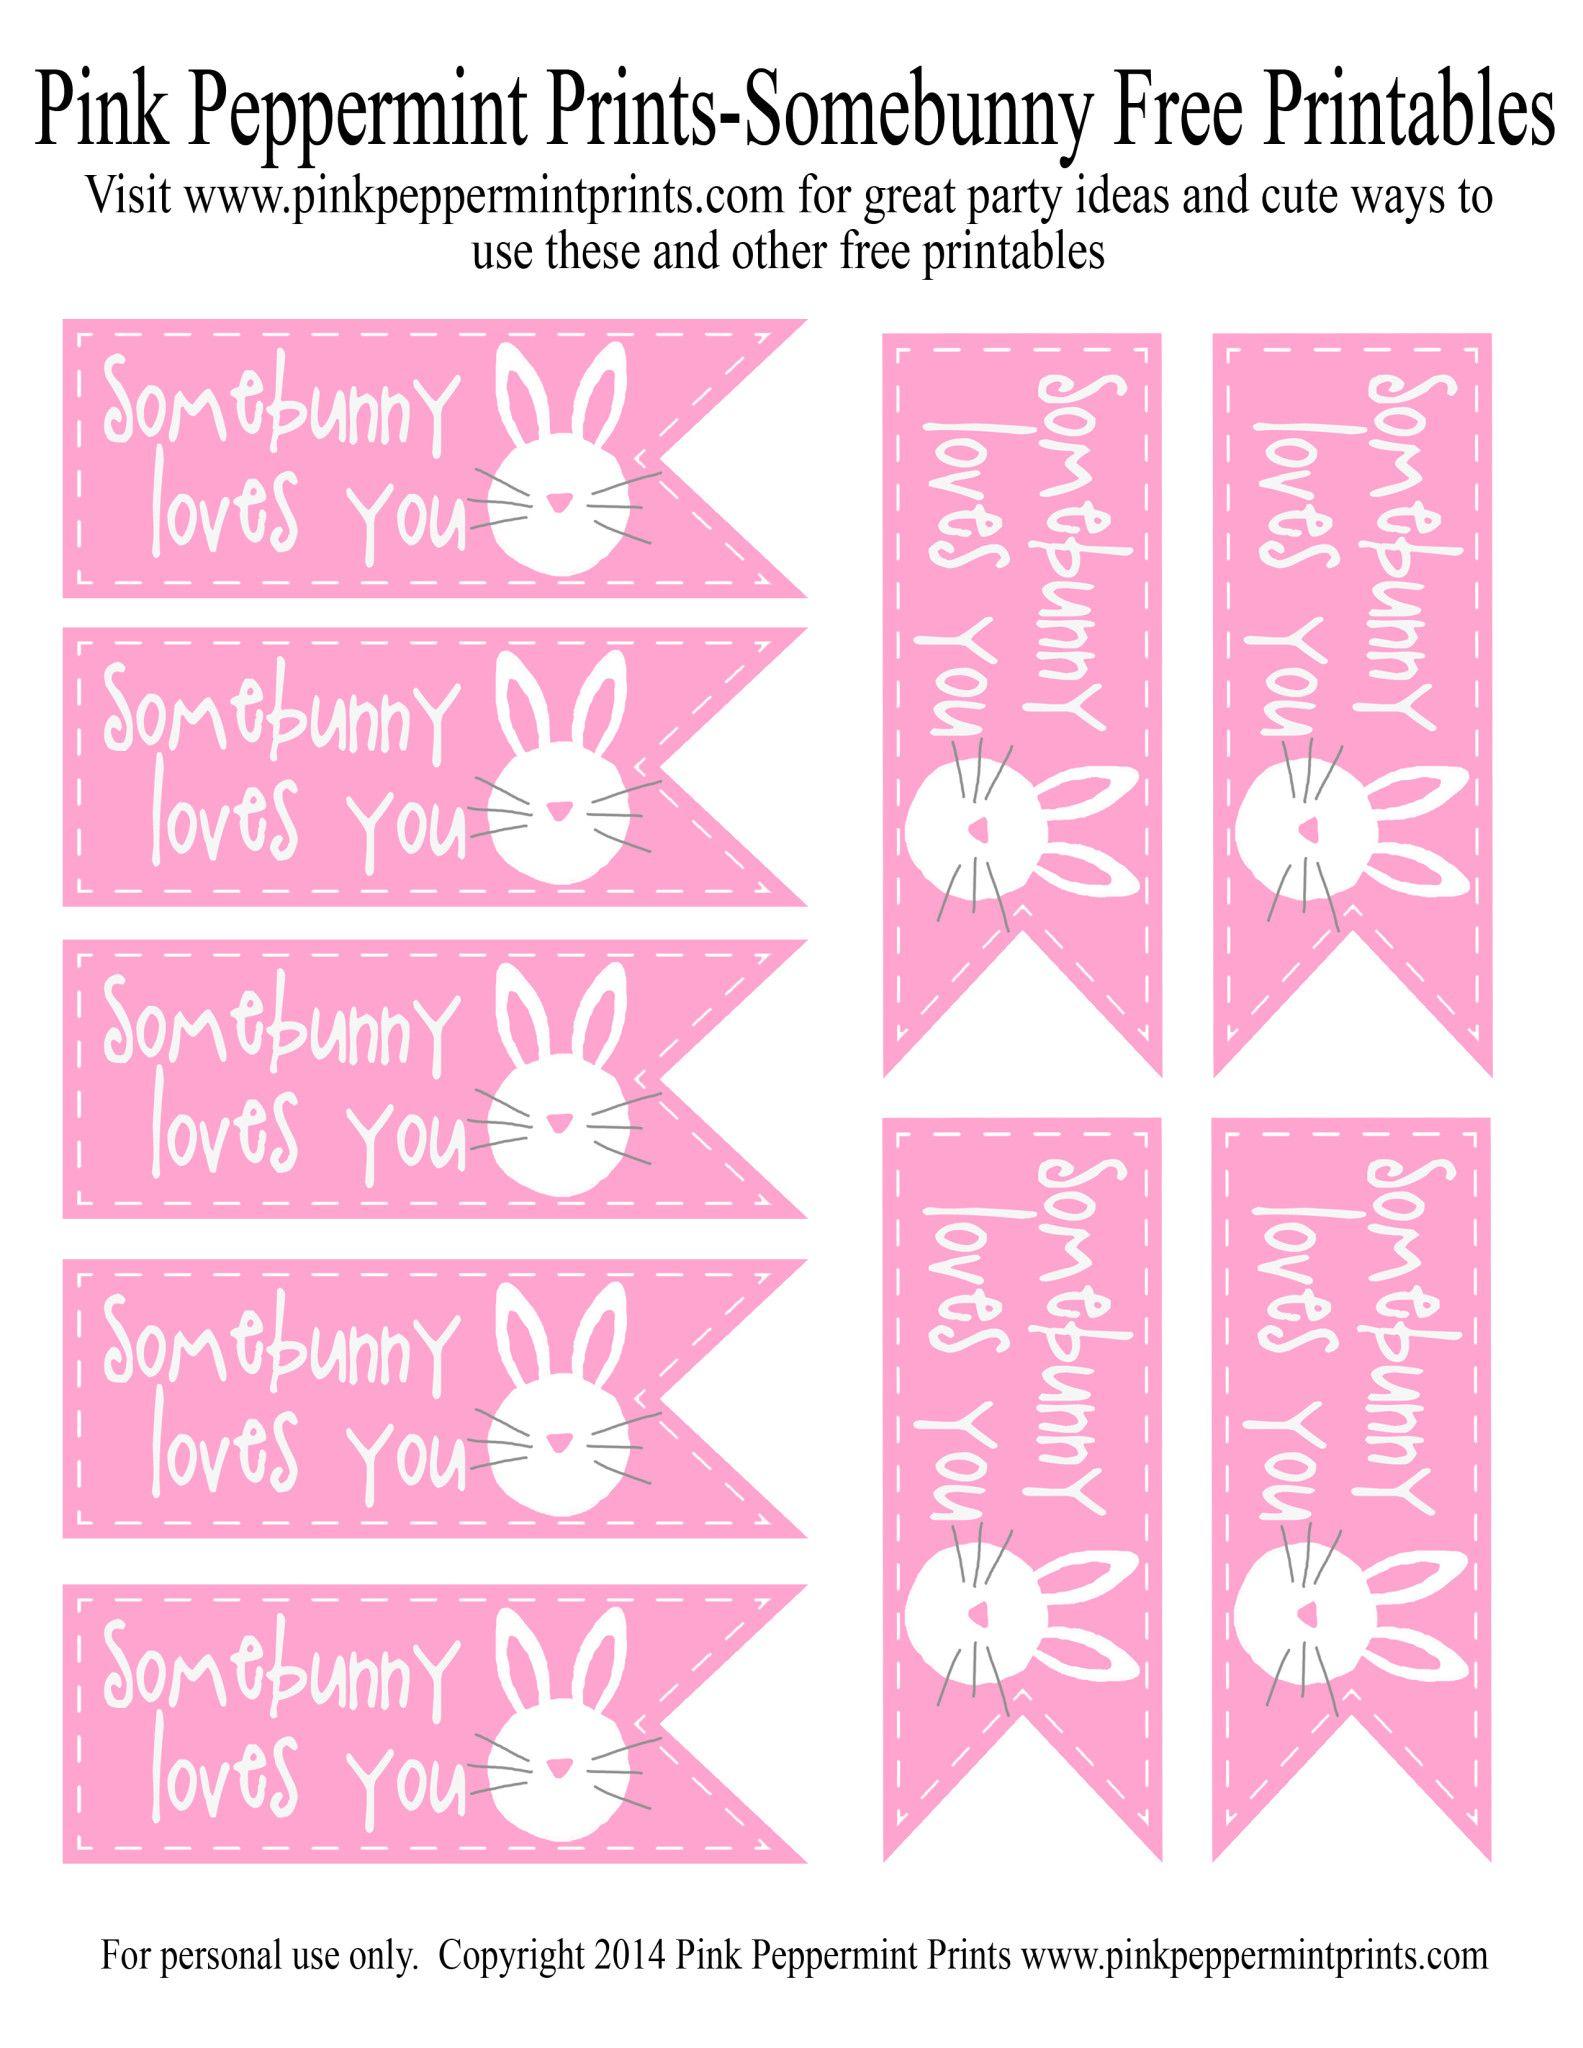 Free Printable Easter Egg Hunt Party Favor Somebunny